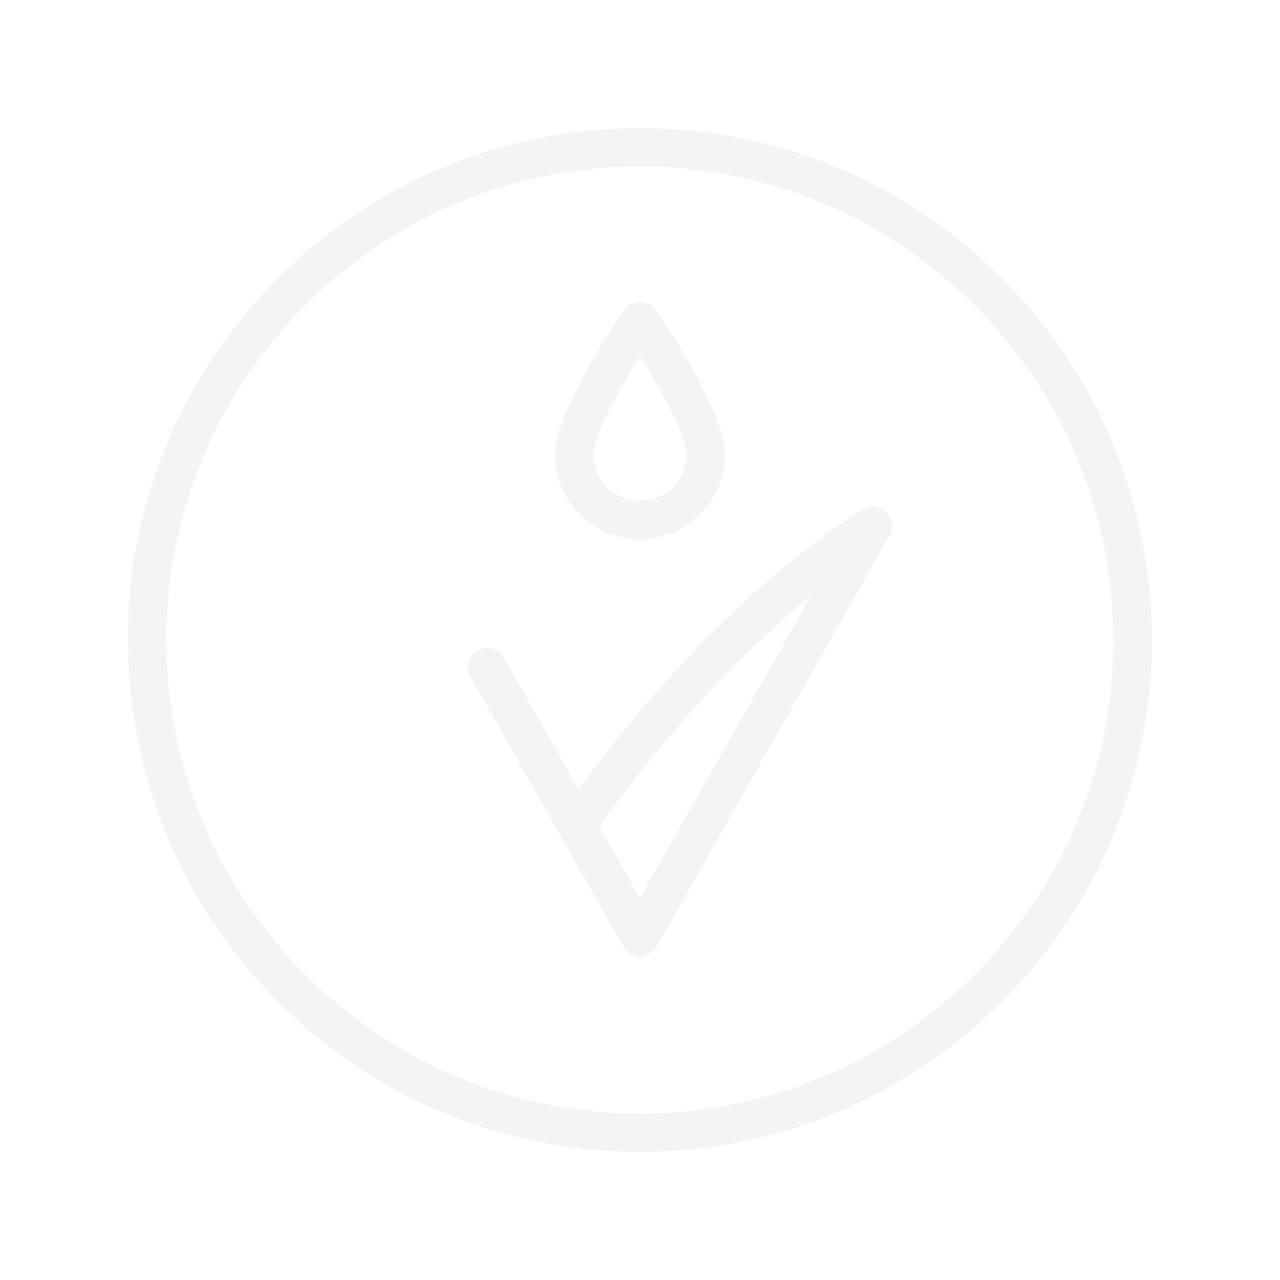 CLARINS Make-Up Trio (Normal/Dry Skin) Travel Gift Set